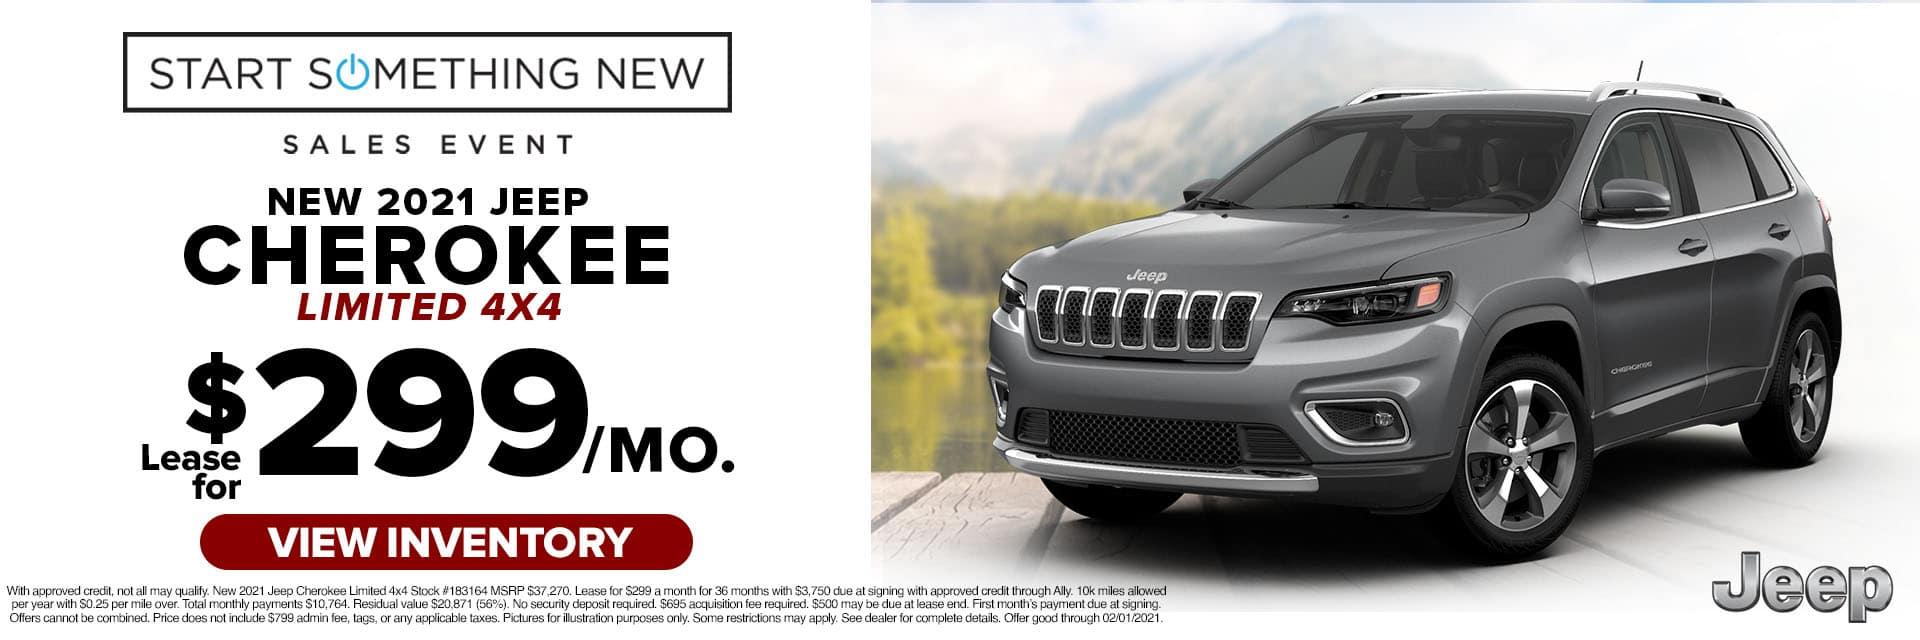 CLCP-January 2021-2020 Jeep Cherokee